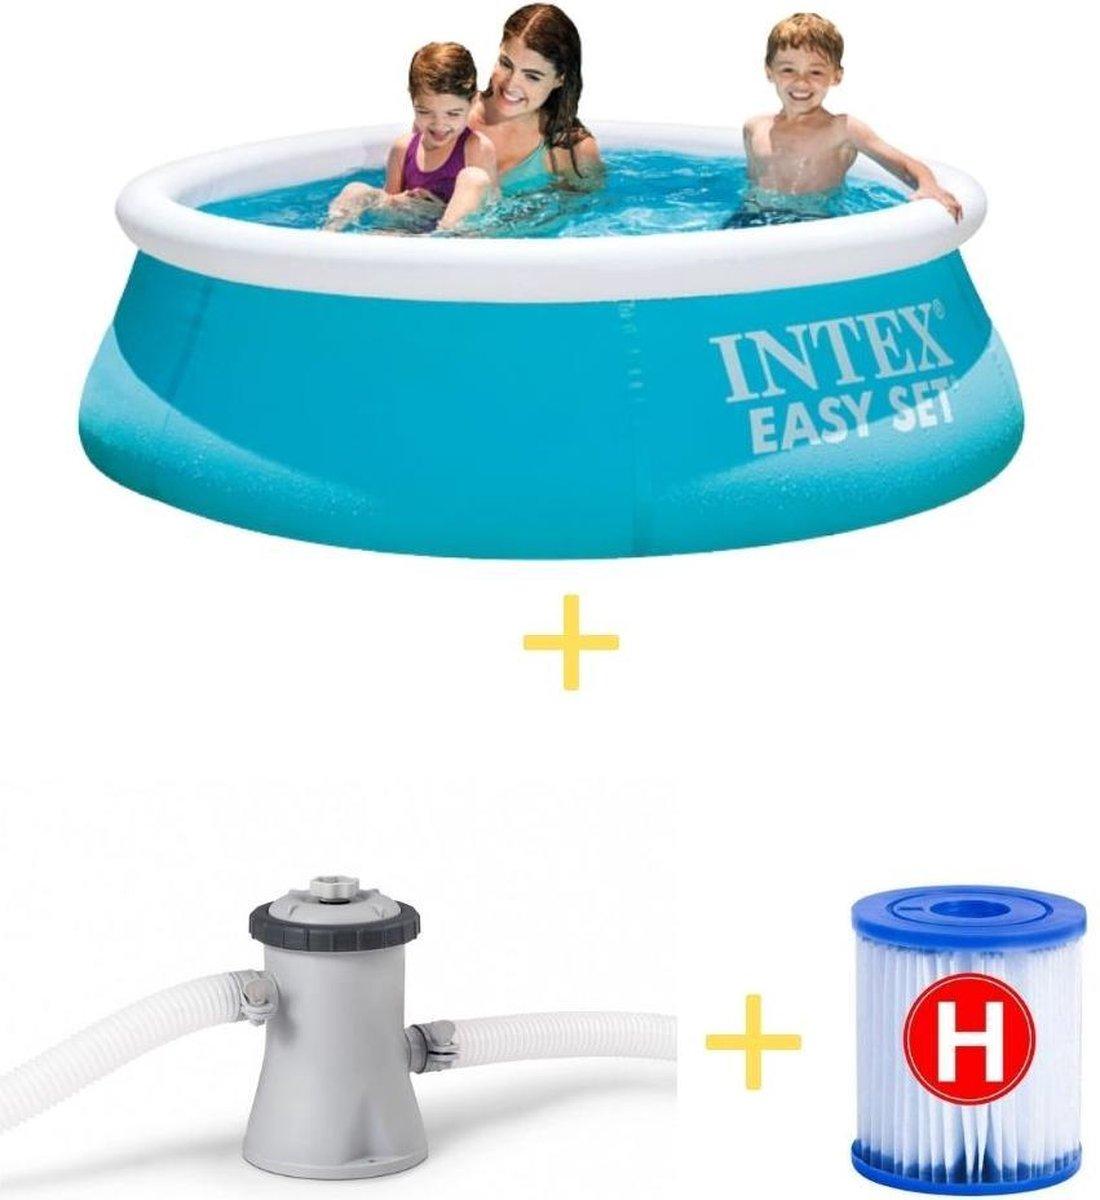 Intex Zwembad - Easy Set - 183 cm - Inclusief Filterpomp & Filter